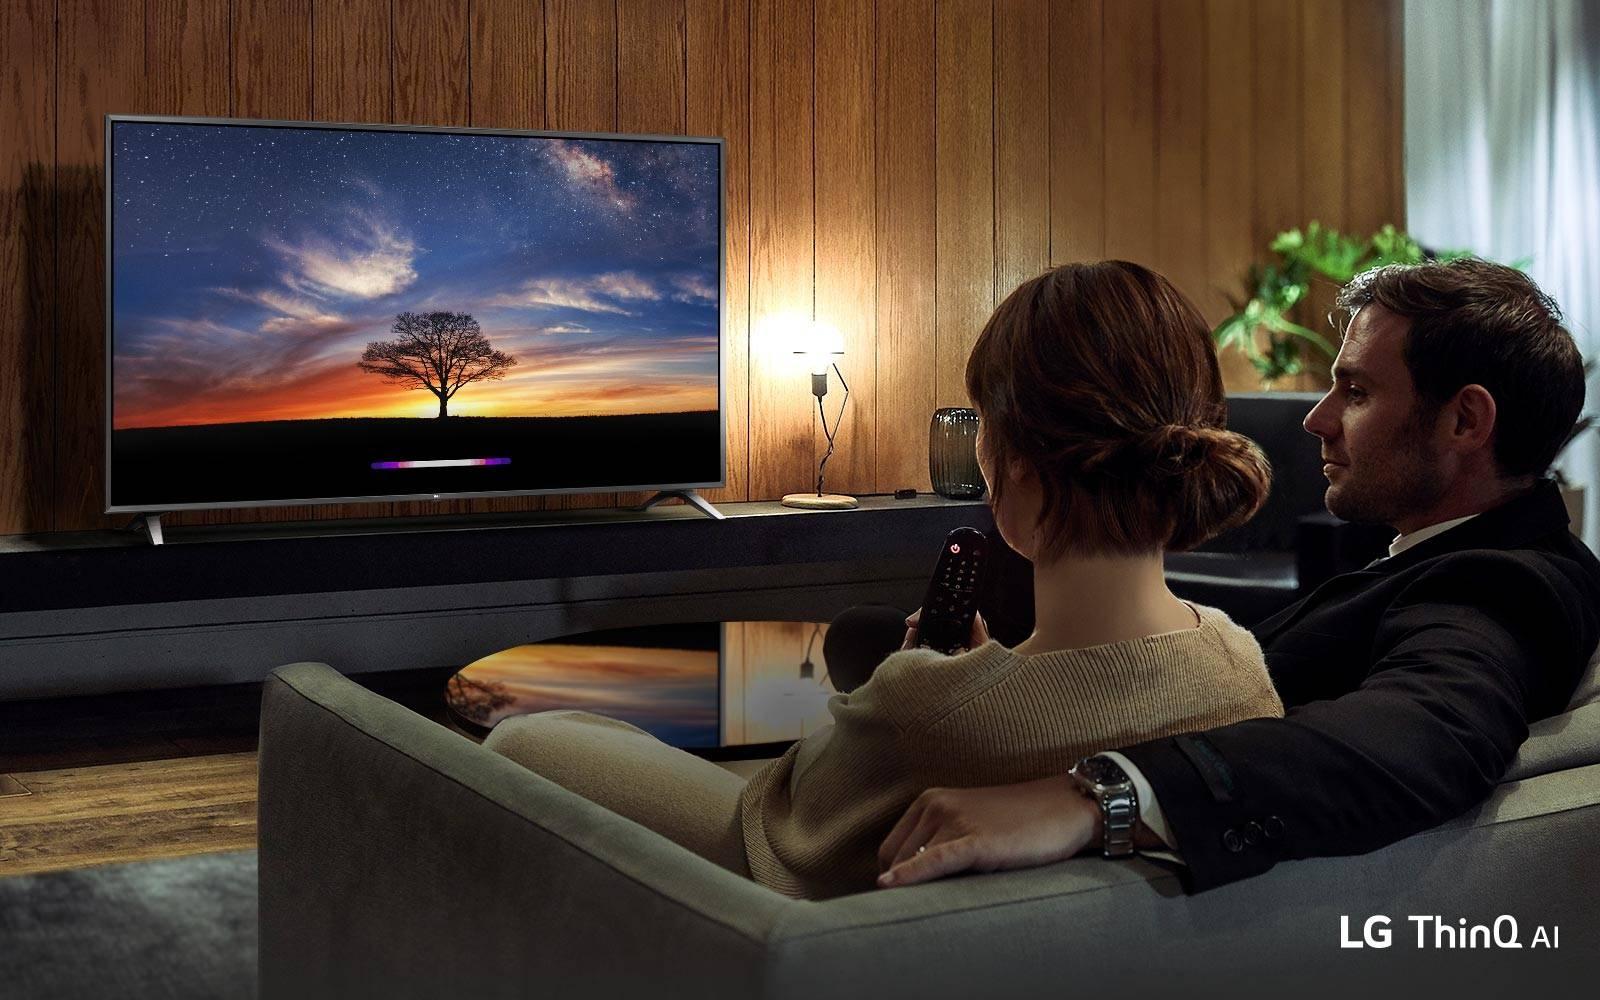 TV-UHD-50-UM73-01-AI-ThinQ-Desktop